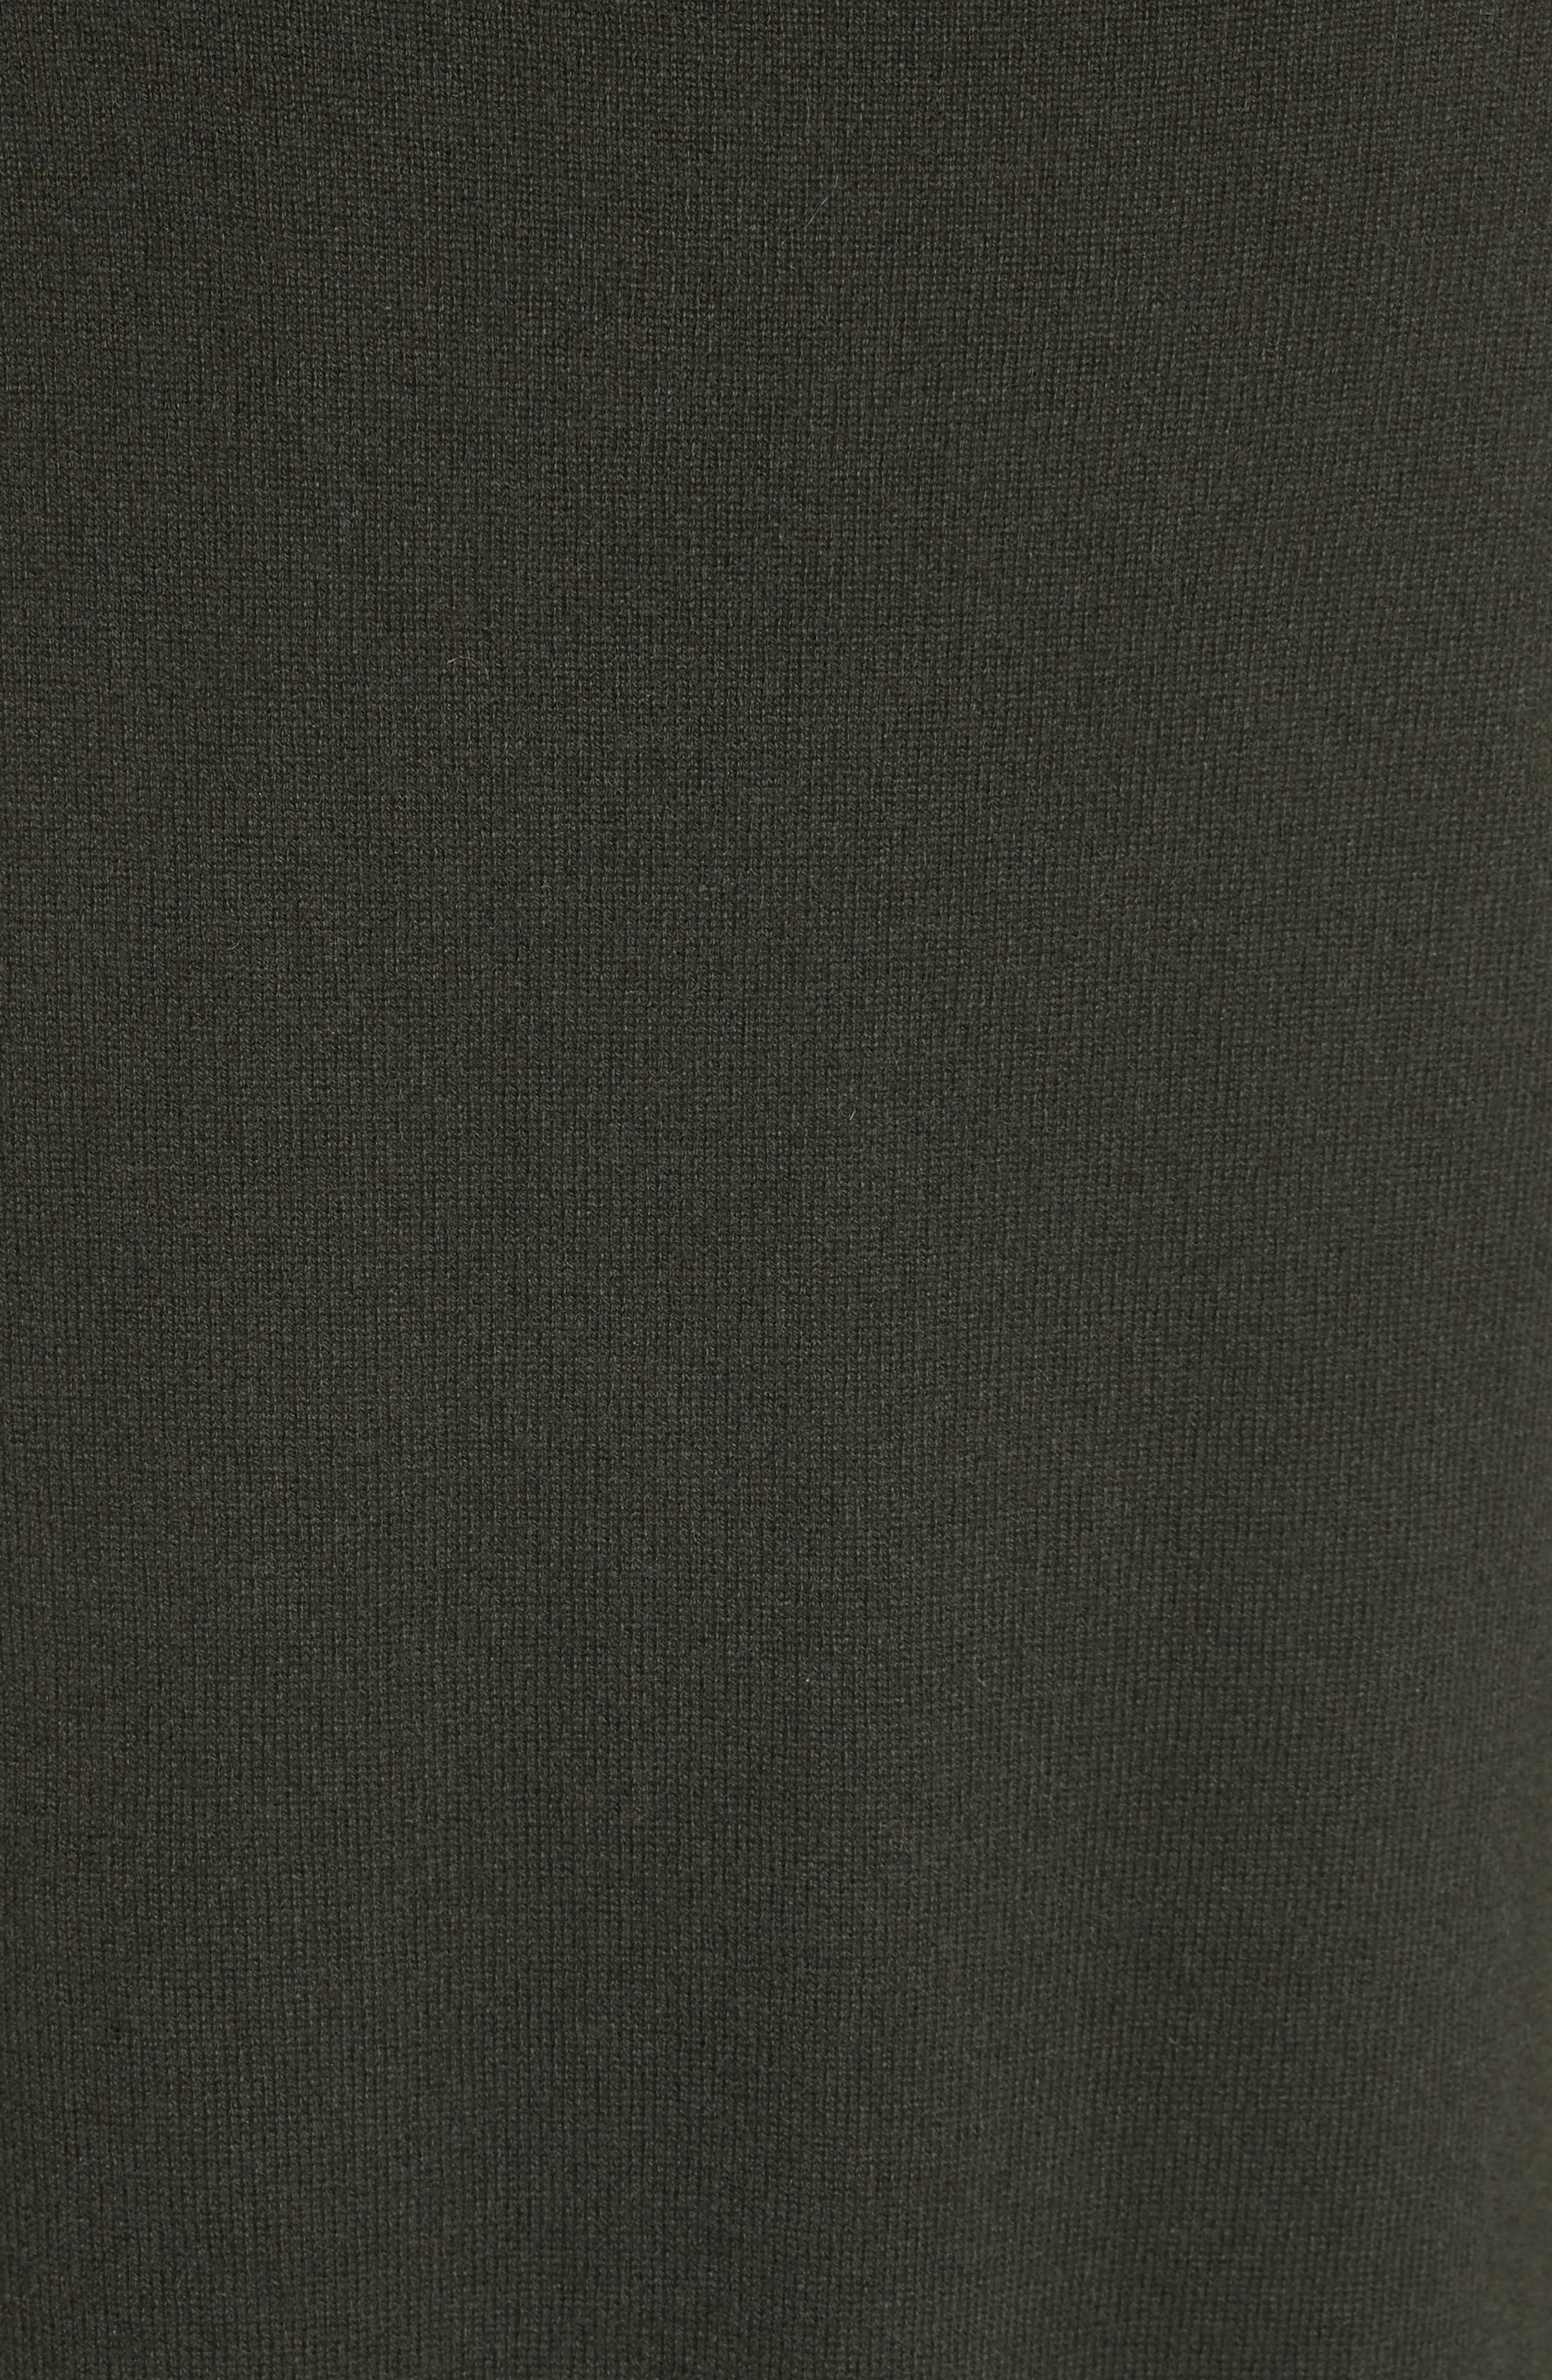 Cashmere Turtleneck Sweater Dress,                             Alternate thumbnail 5, color,                             Dark Olive